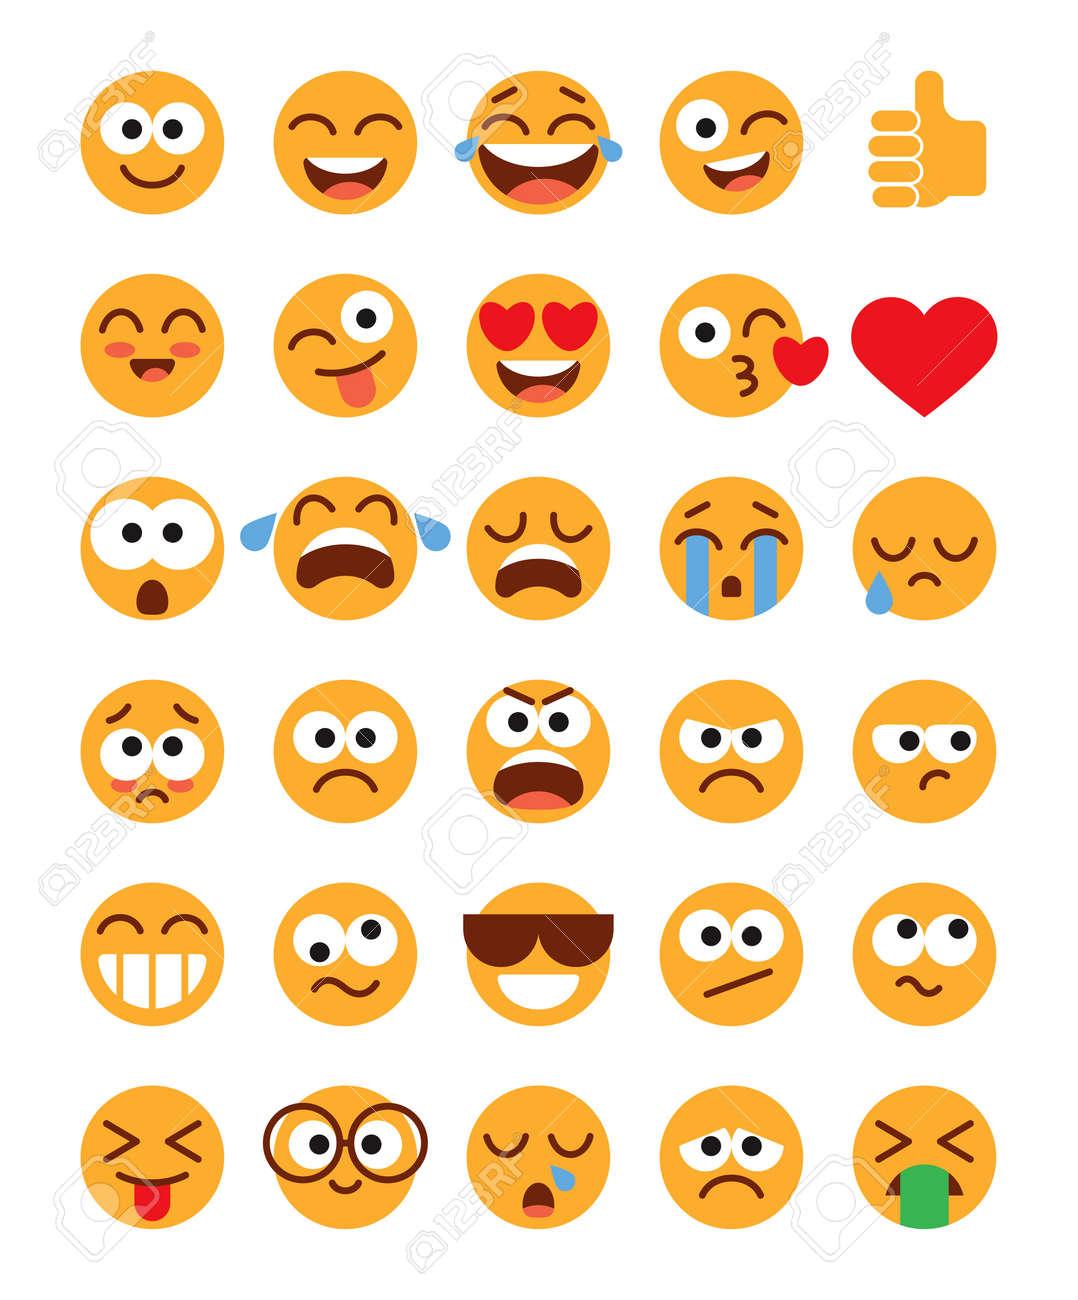 Emoji pack. Set of funny classic emojis. Flat style. Isolated on white background. Vector illustration - 168559961